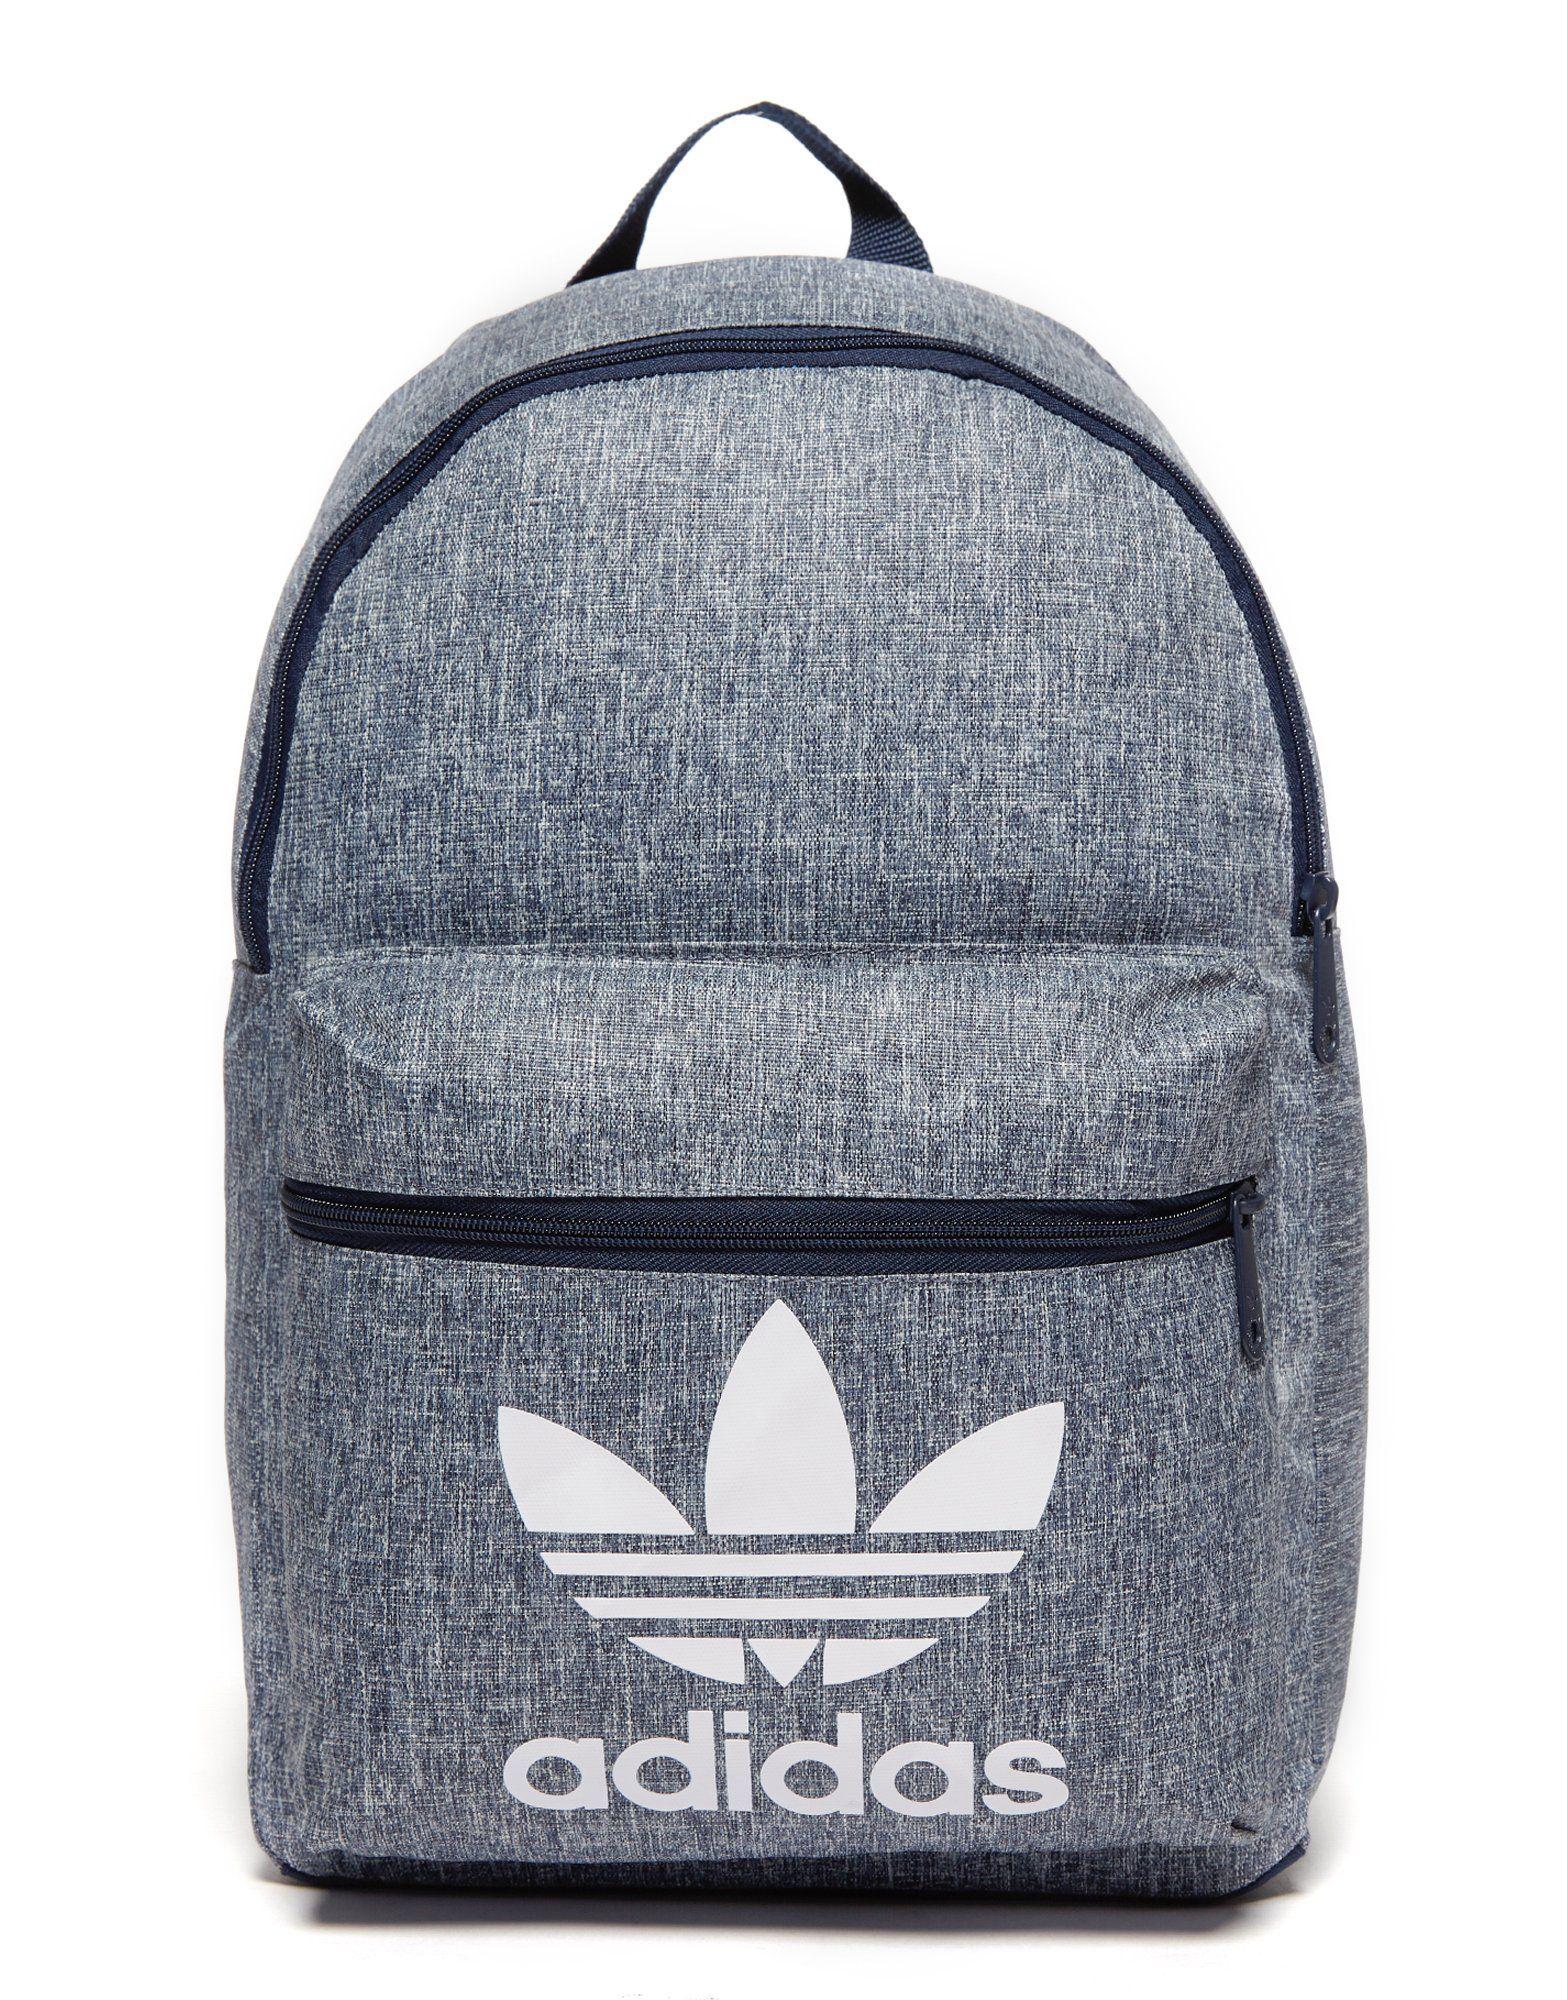 adidas Originals Classic Melange Backpack